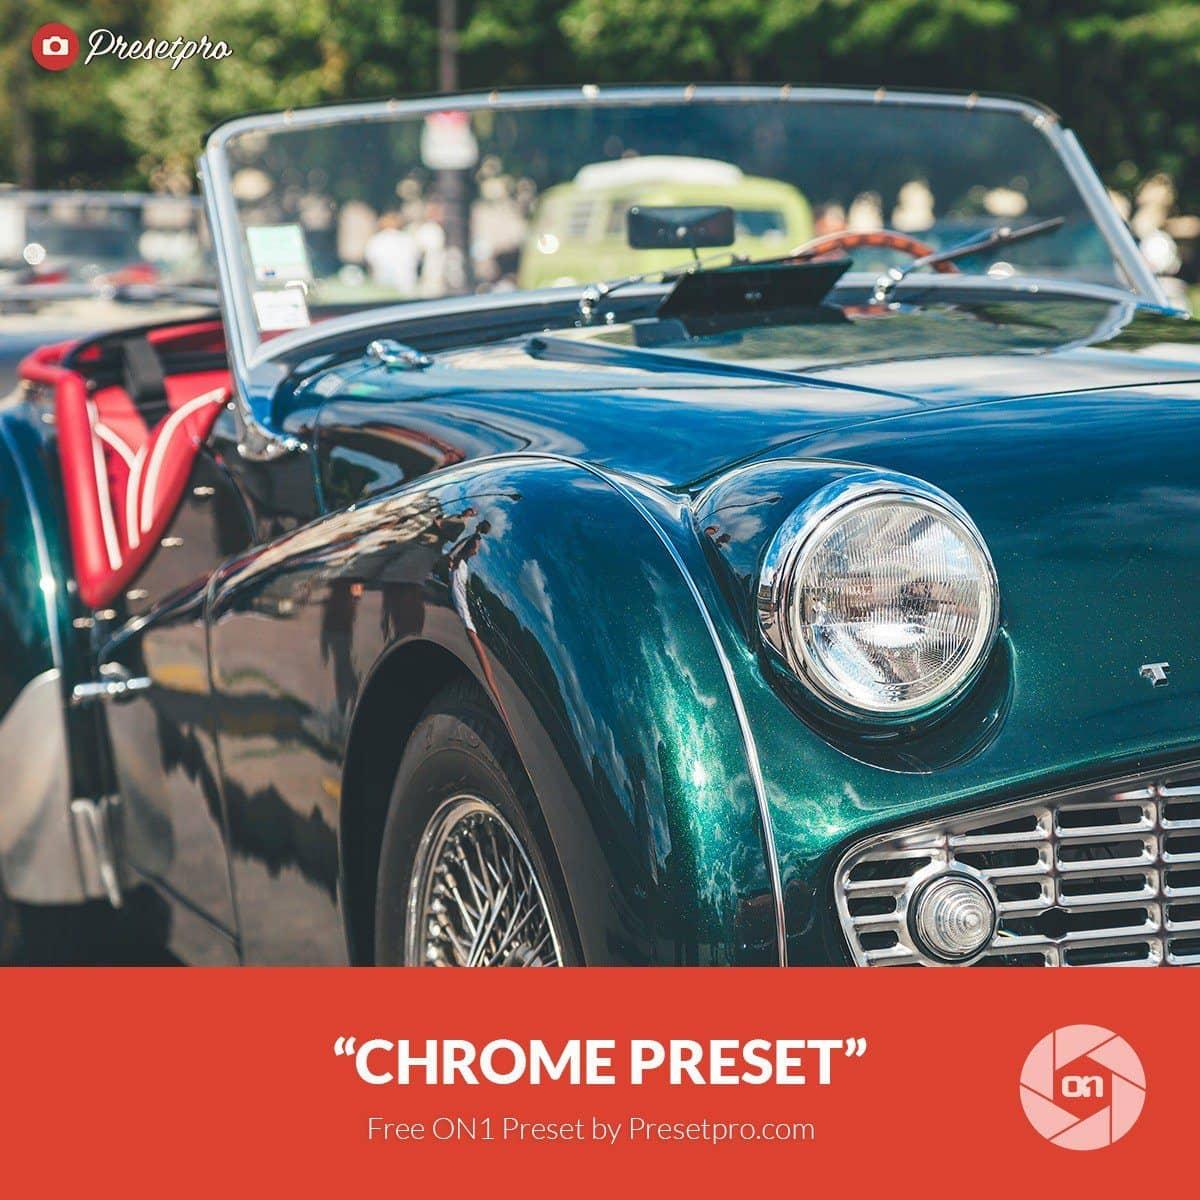 Free-On1-Preset-Chrome-Presetpro.com